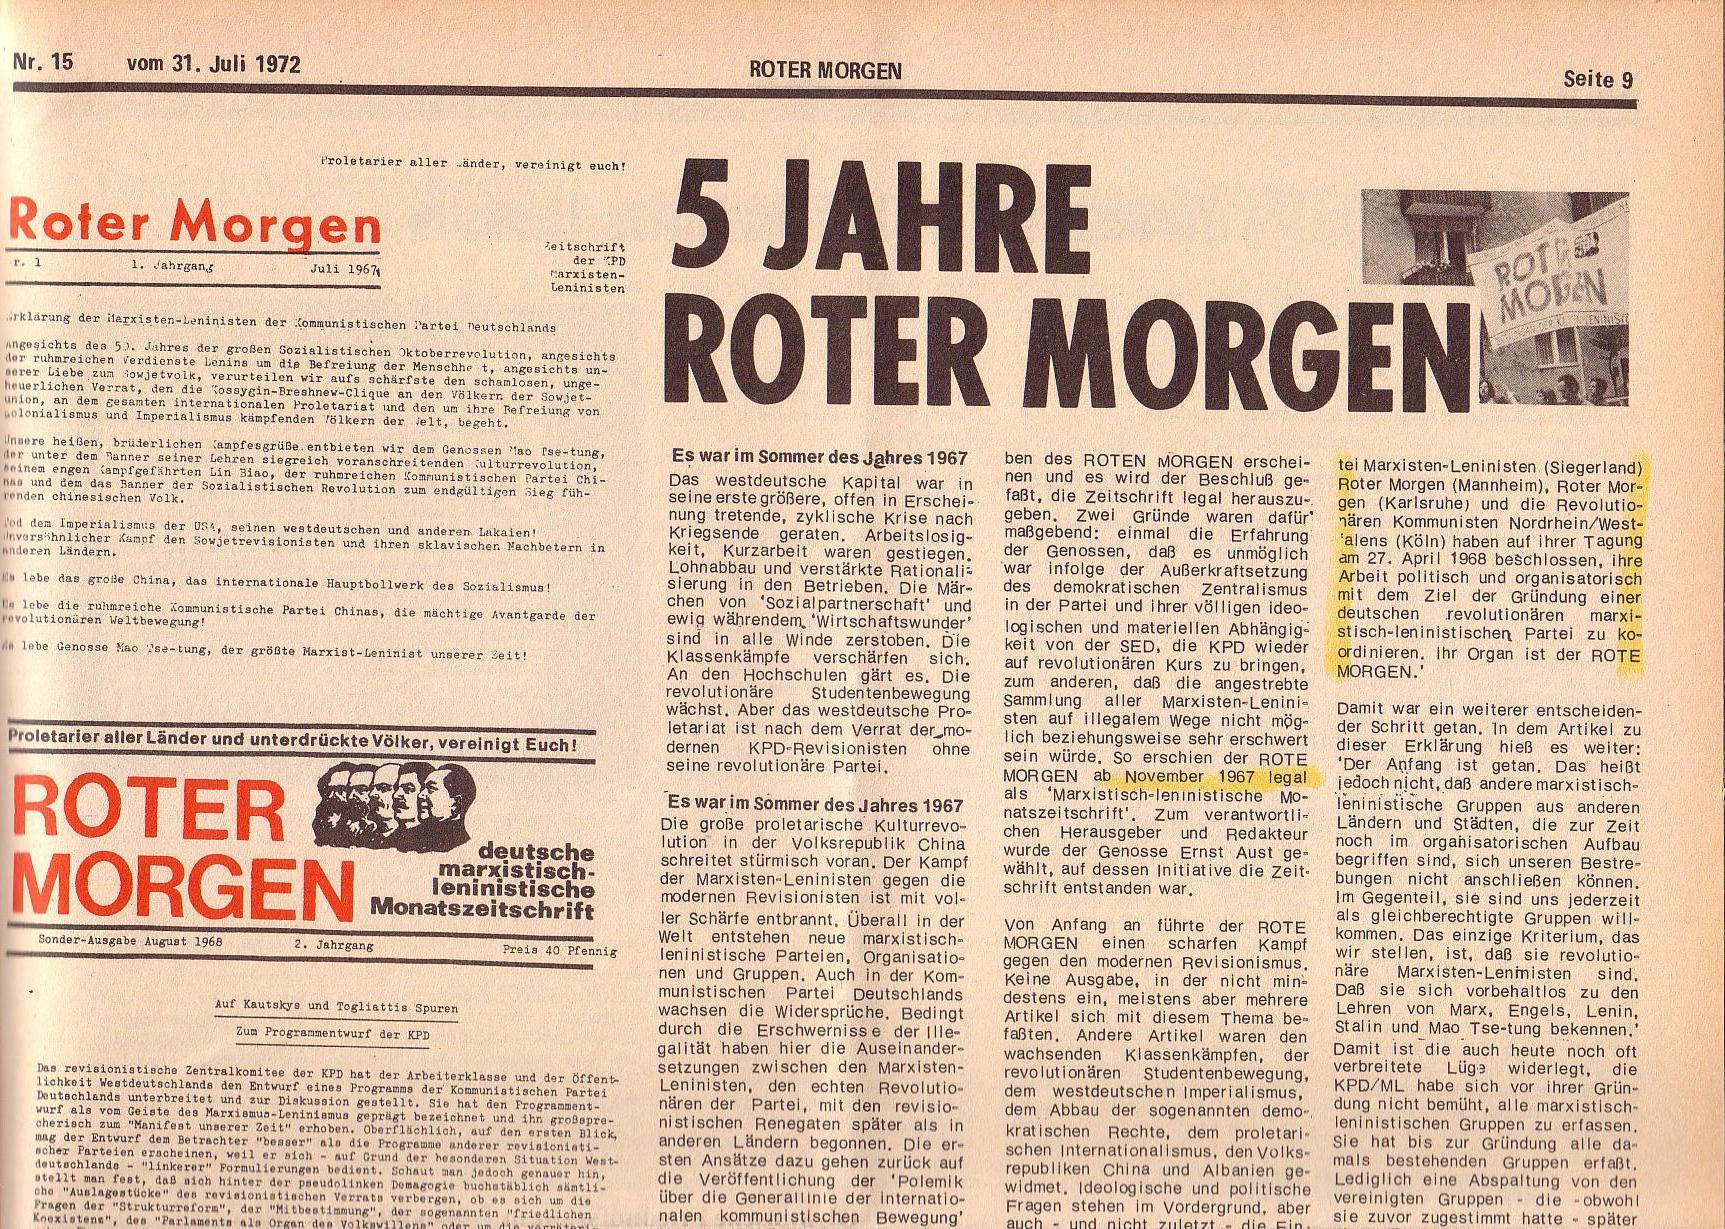 Roter Morgen, 6. Jg., 31. Juli 1972, Nr. 15, Seite 9a